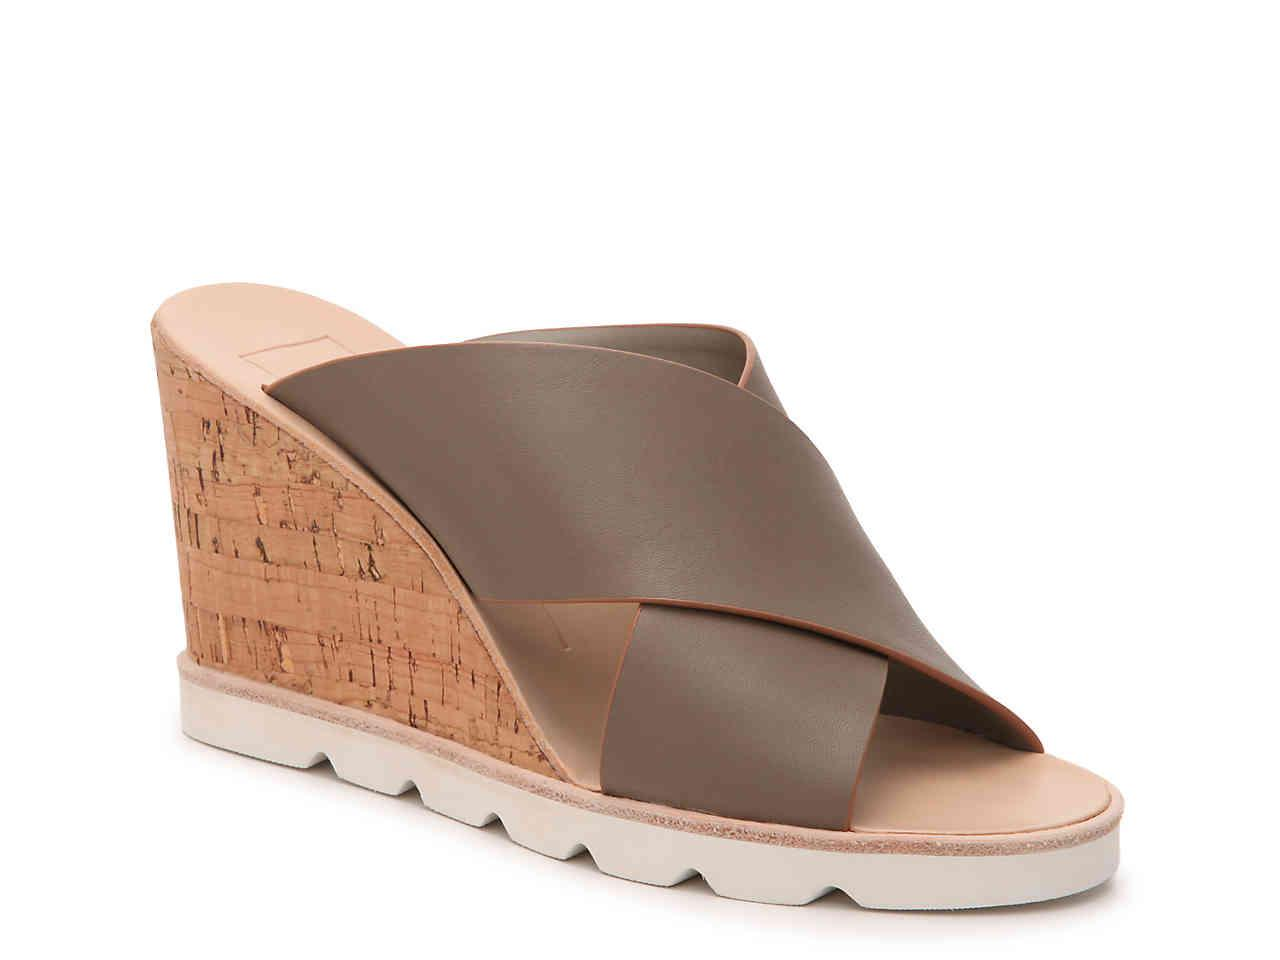 Dolce Vita Lida Wedge Sandal in Khaki